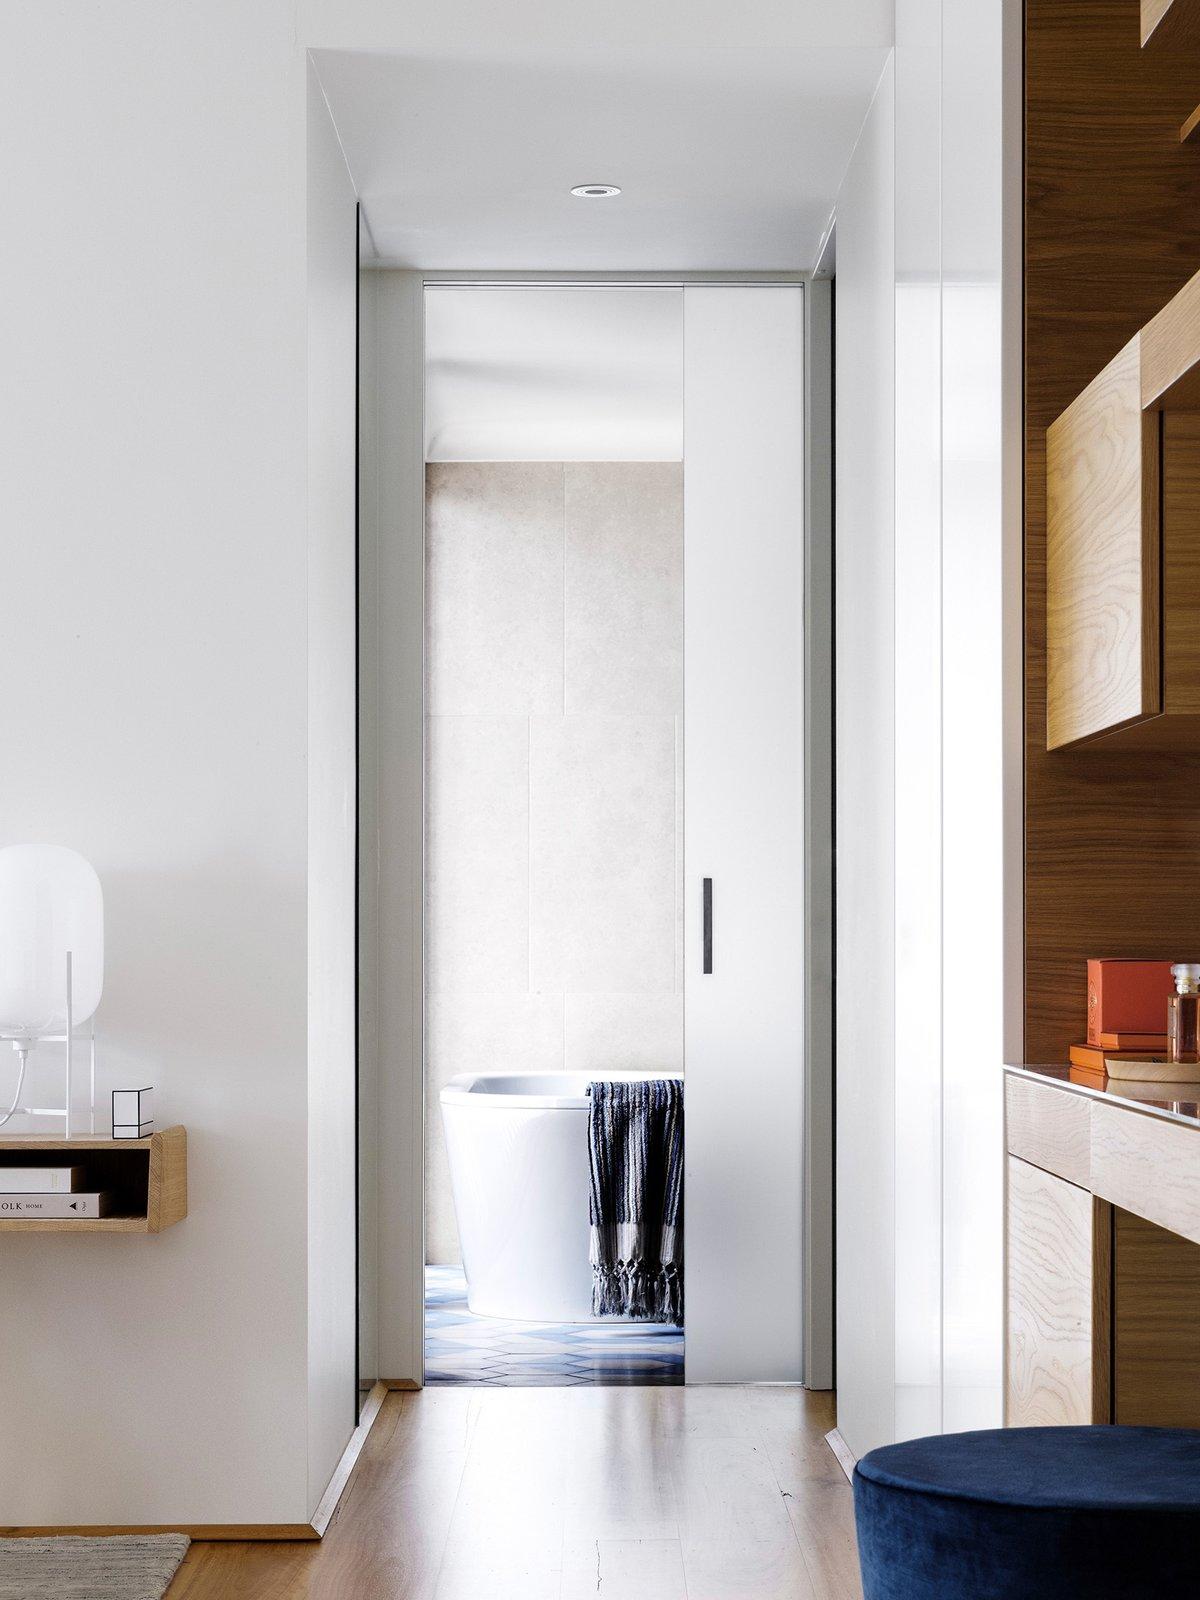 © Justin Alexander  Martello Tower Home by Luigi Rosselli Architects